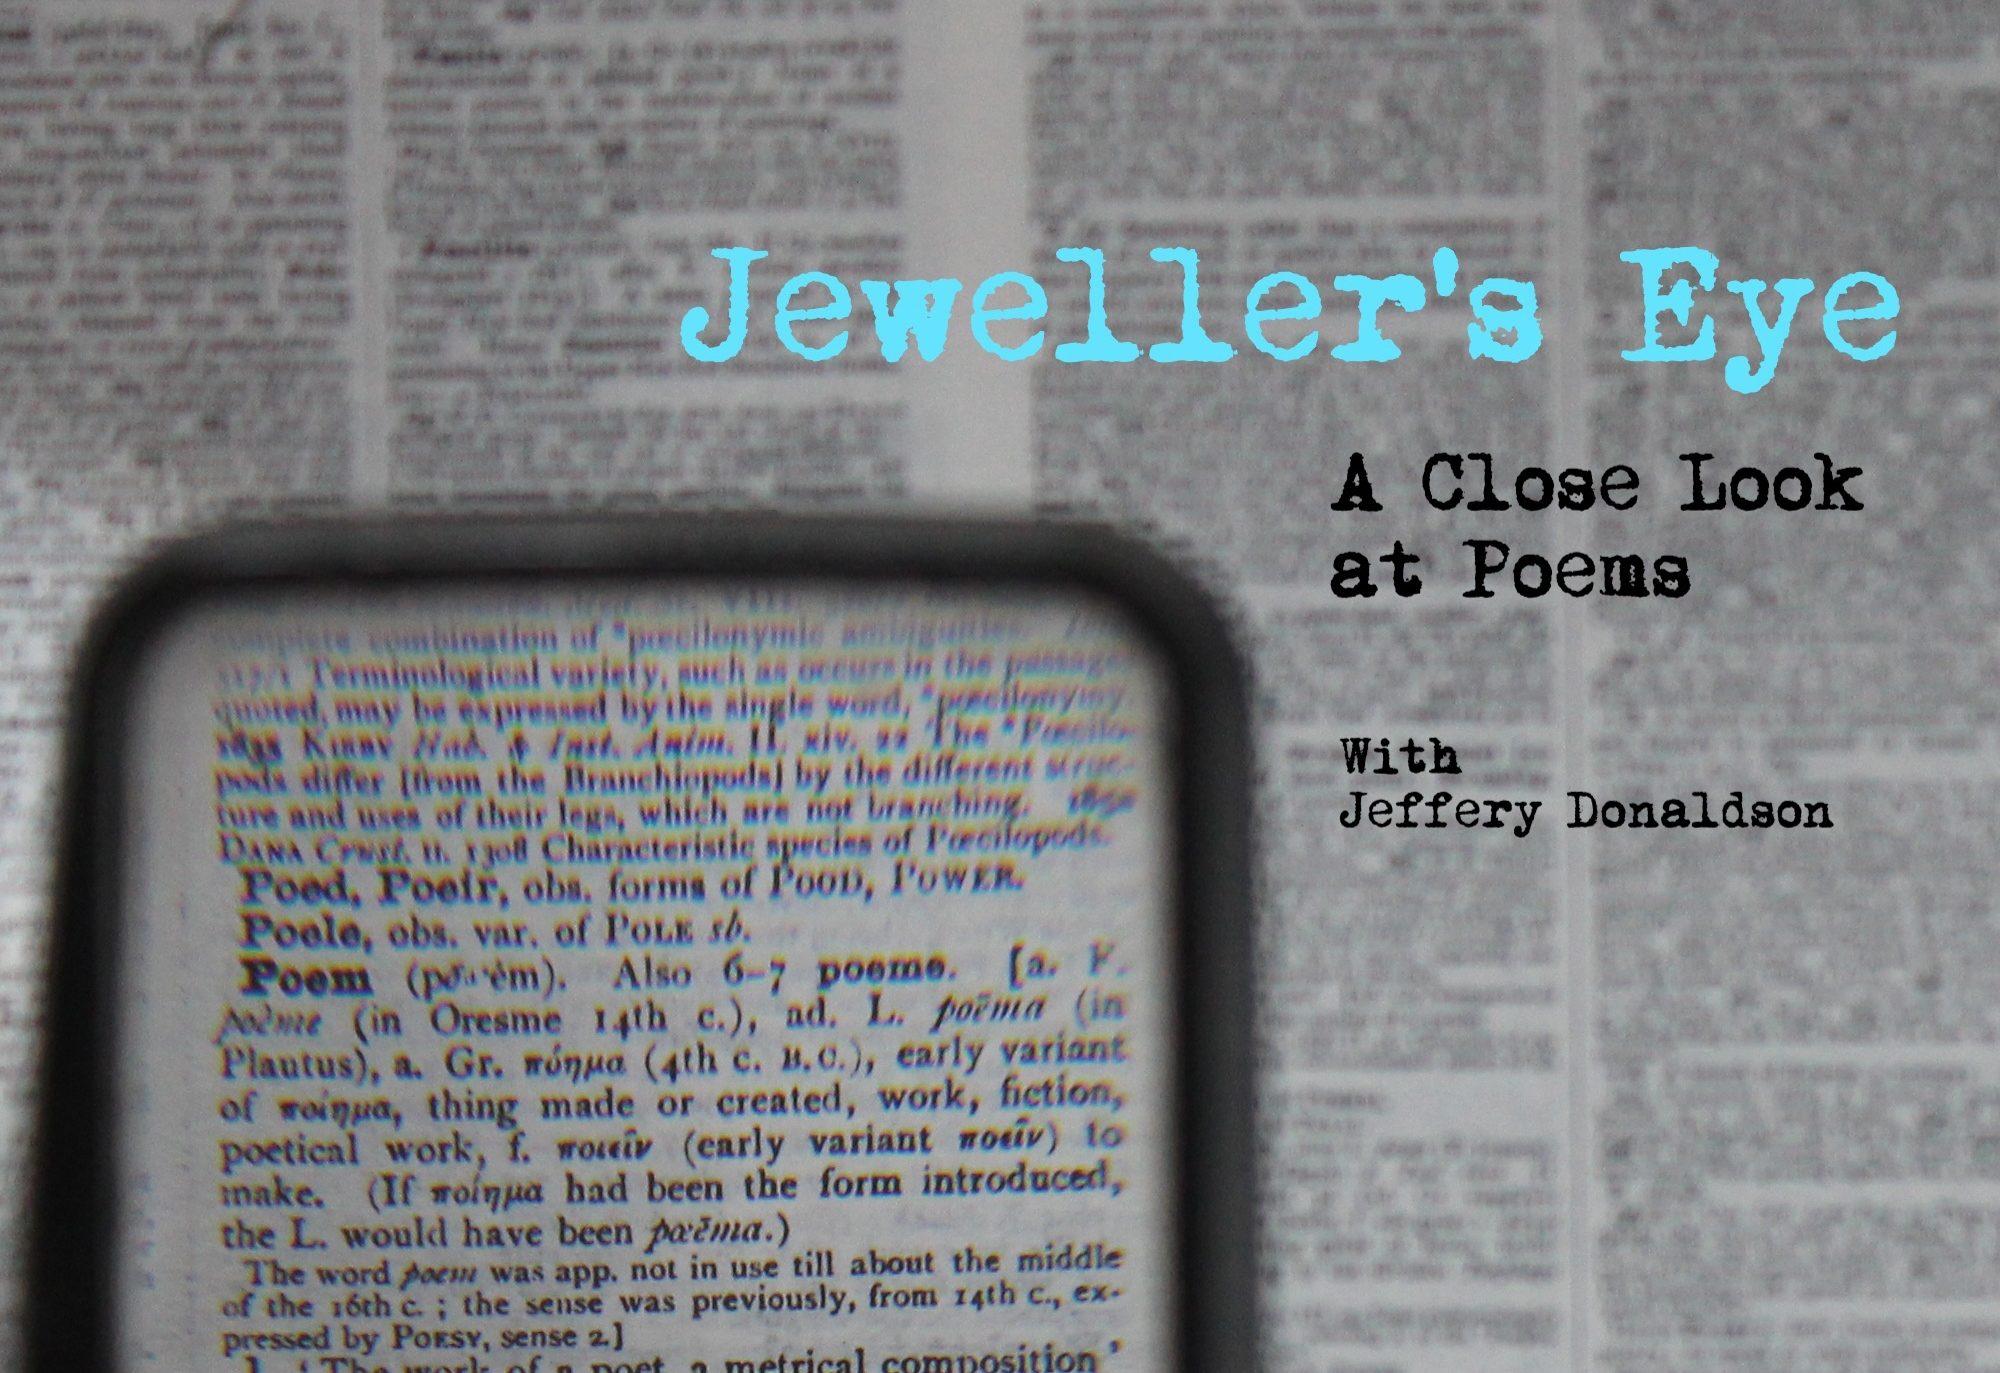 Jeweller's Eye